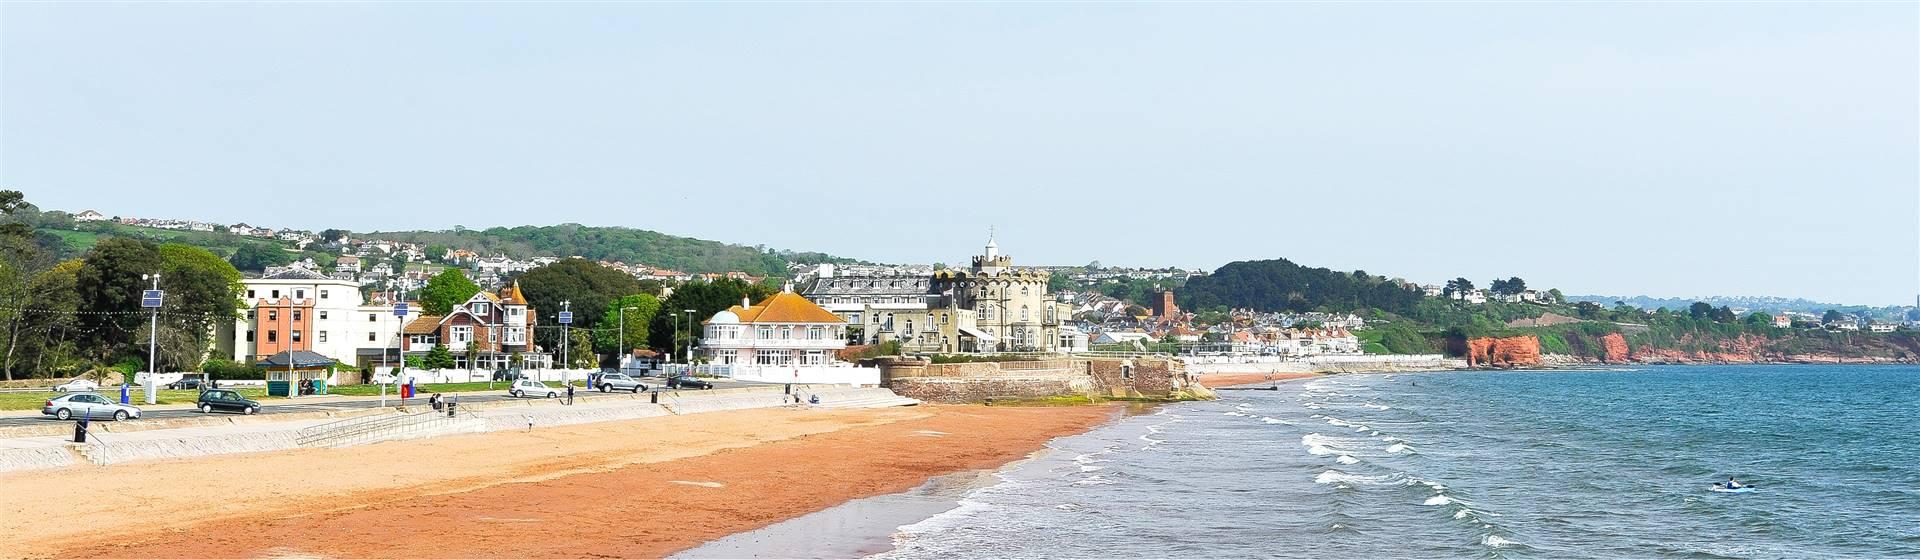 Paignton & The English Riviera 2022